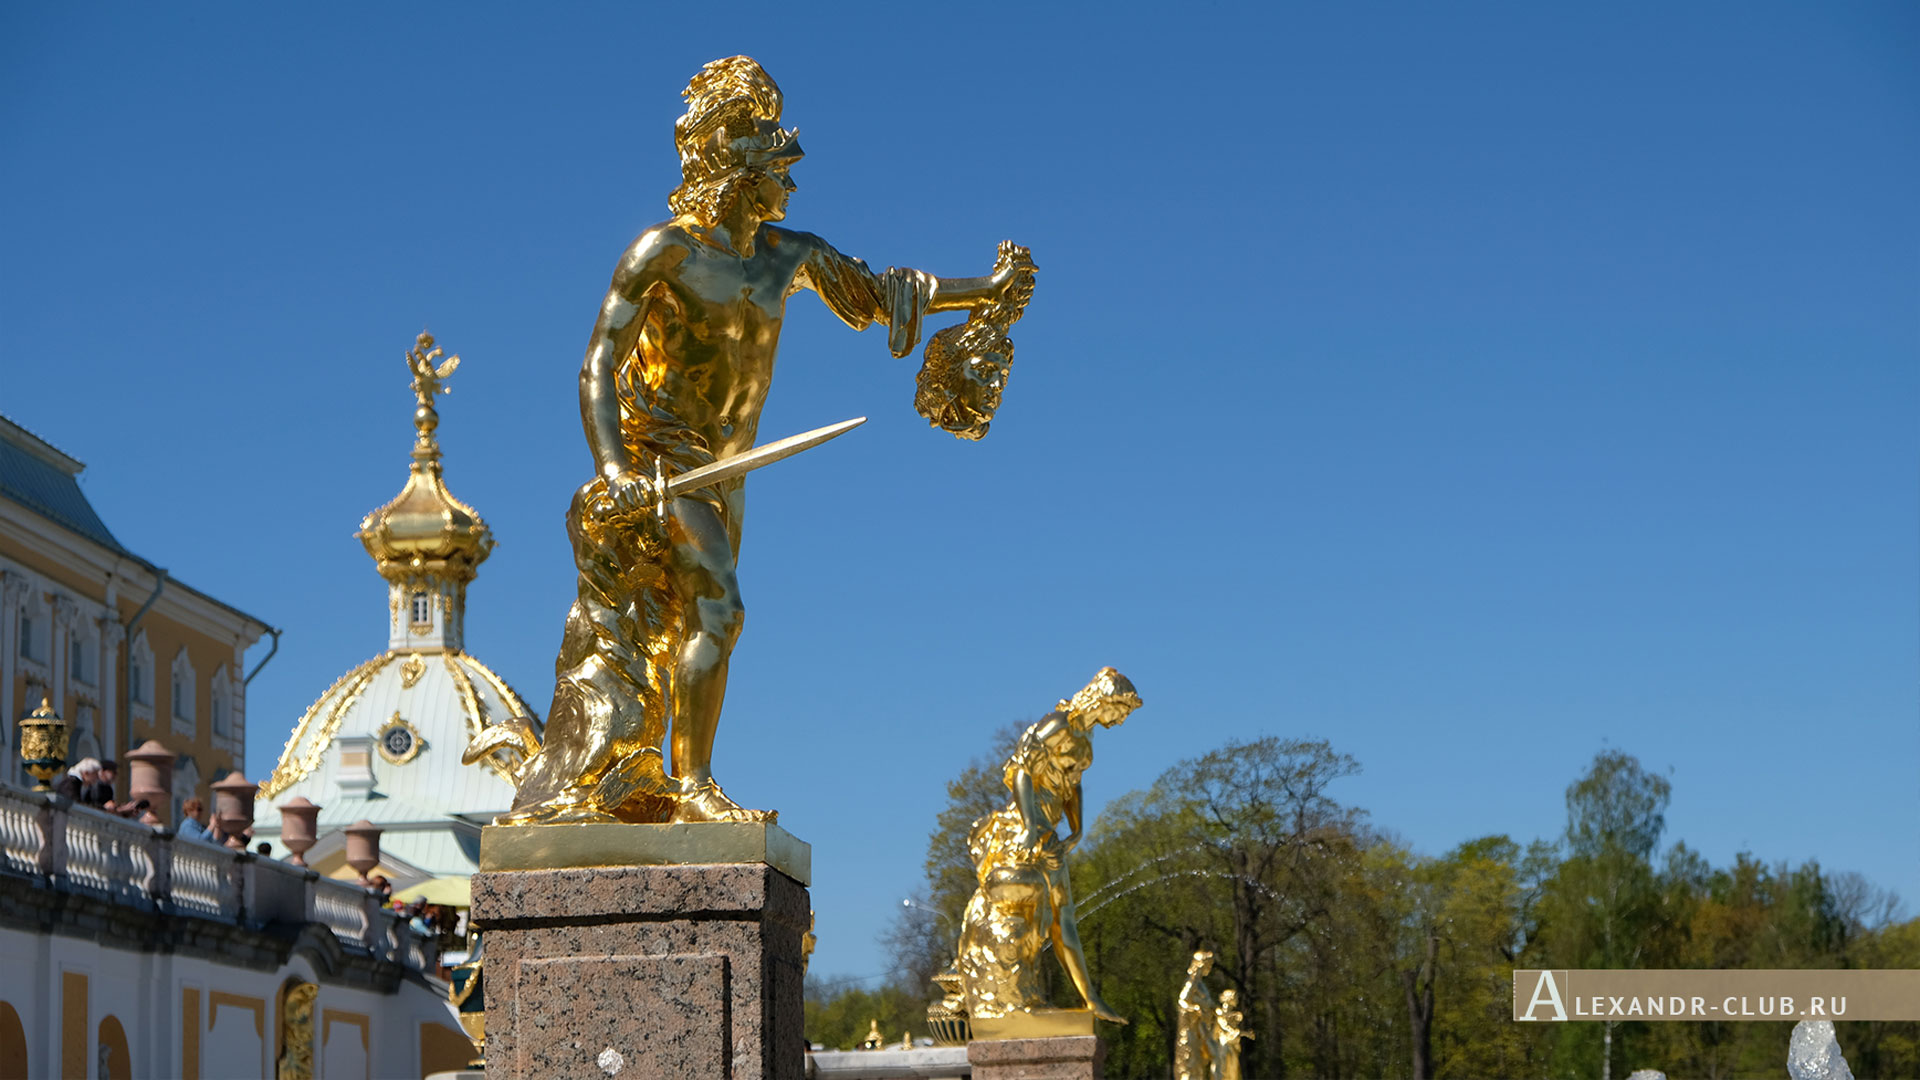 Петергоф, весна, Нижний парк, фонтан «Большой каскад», Персей